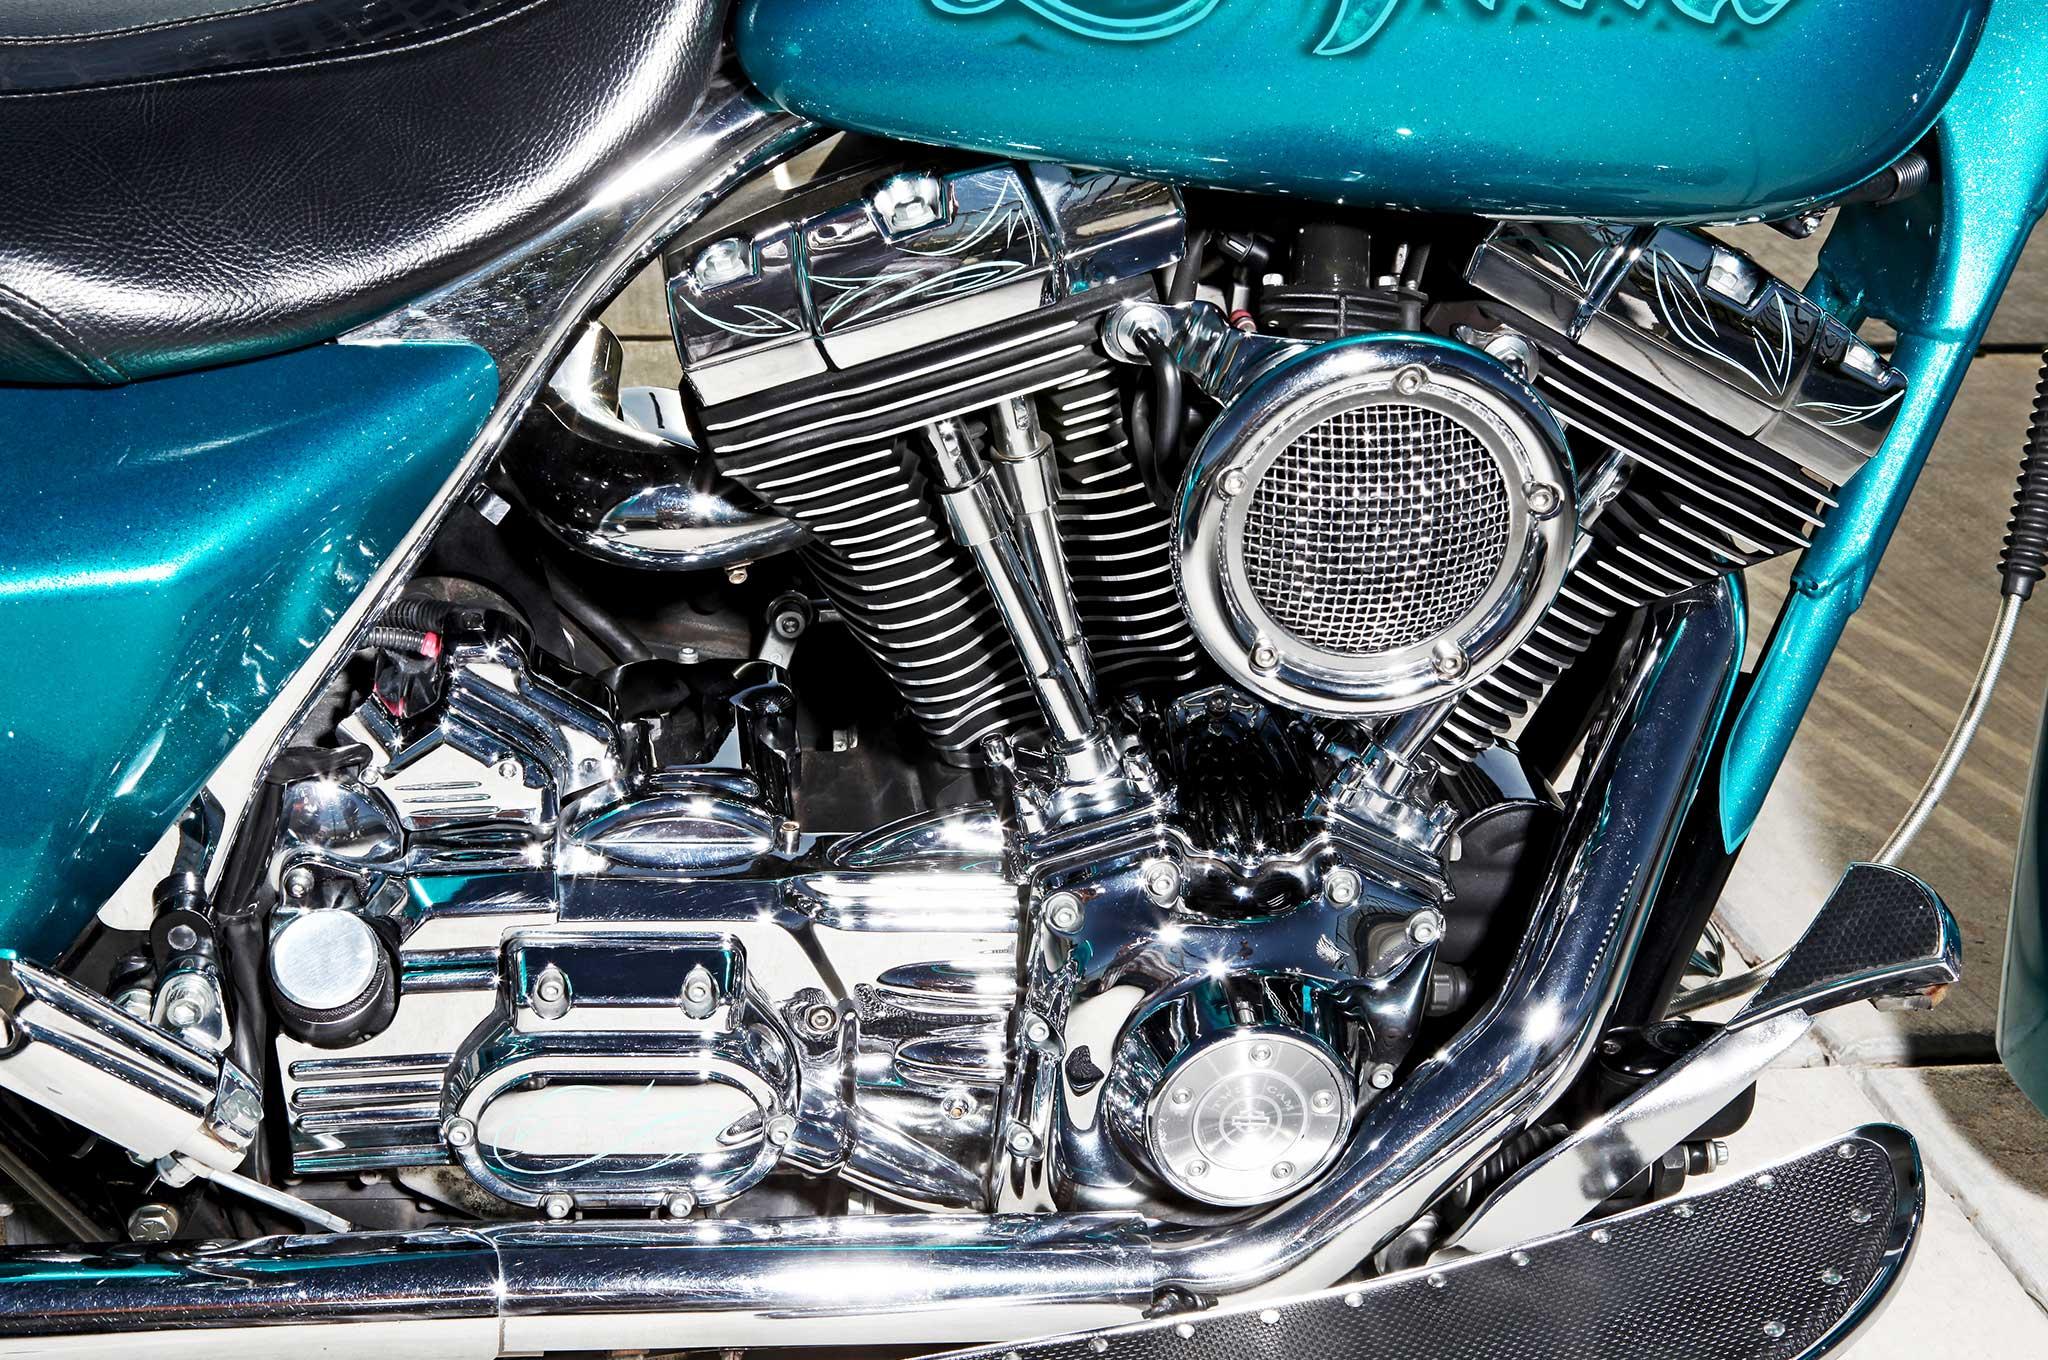 2004 Harley Davidson Road King King Of The Road Lowrider